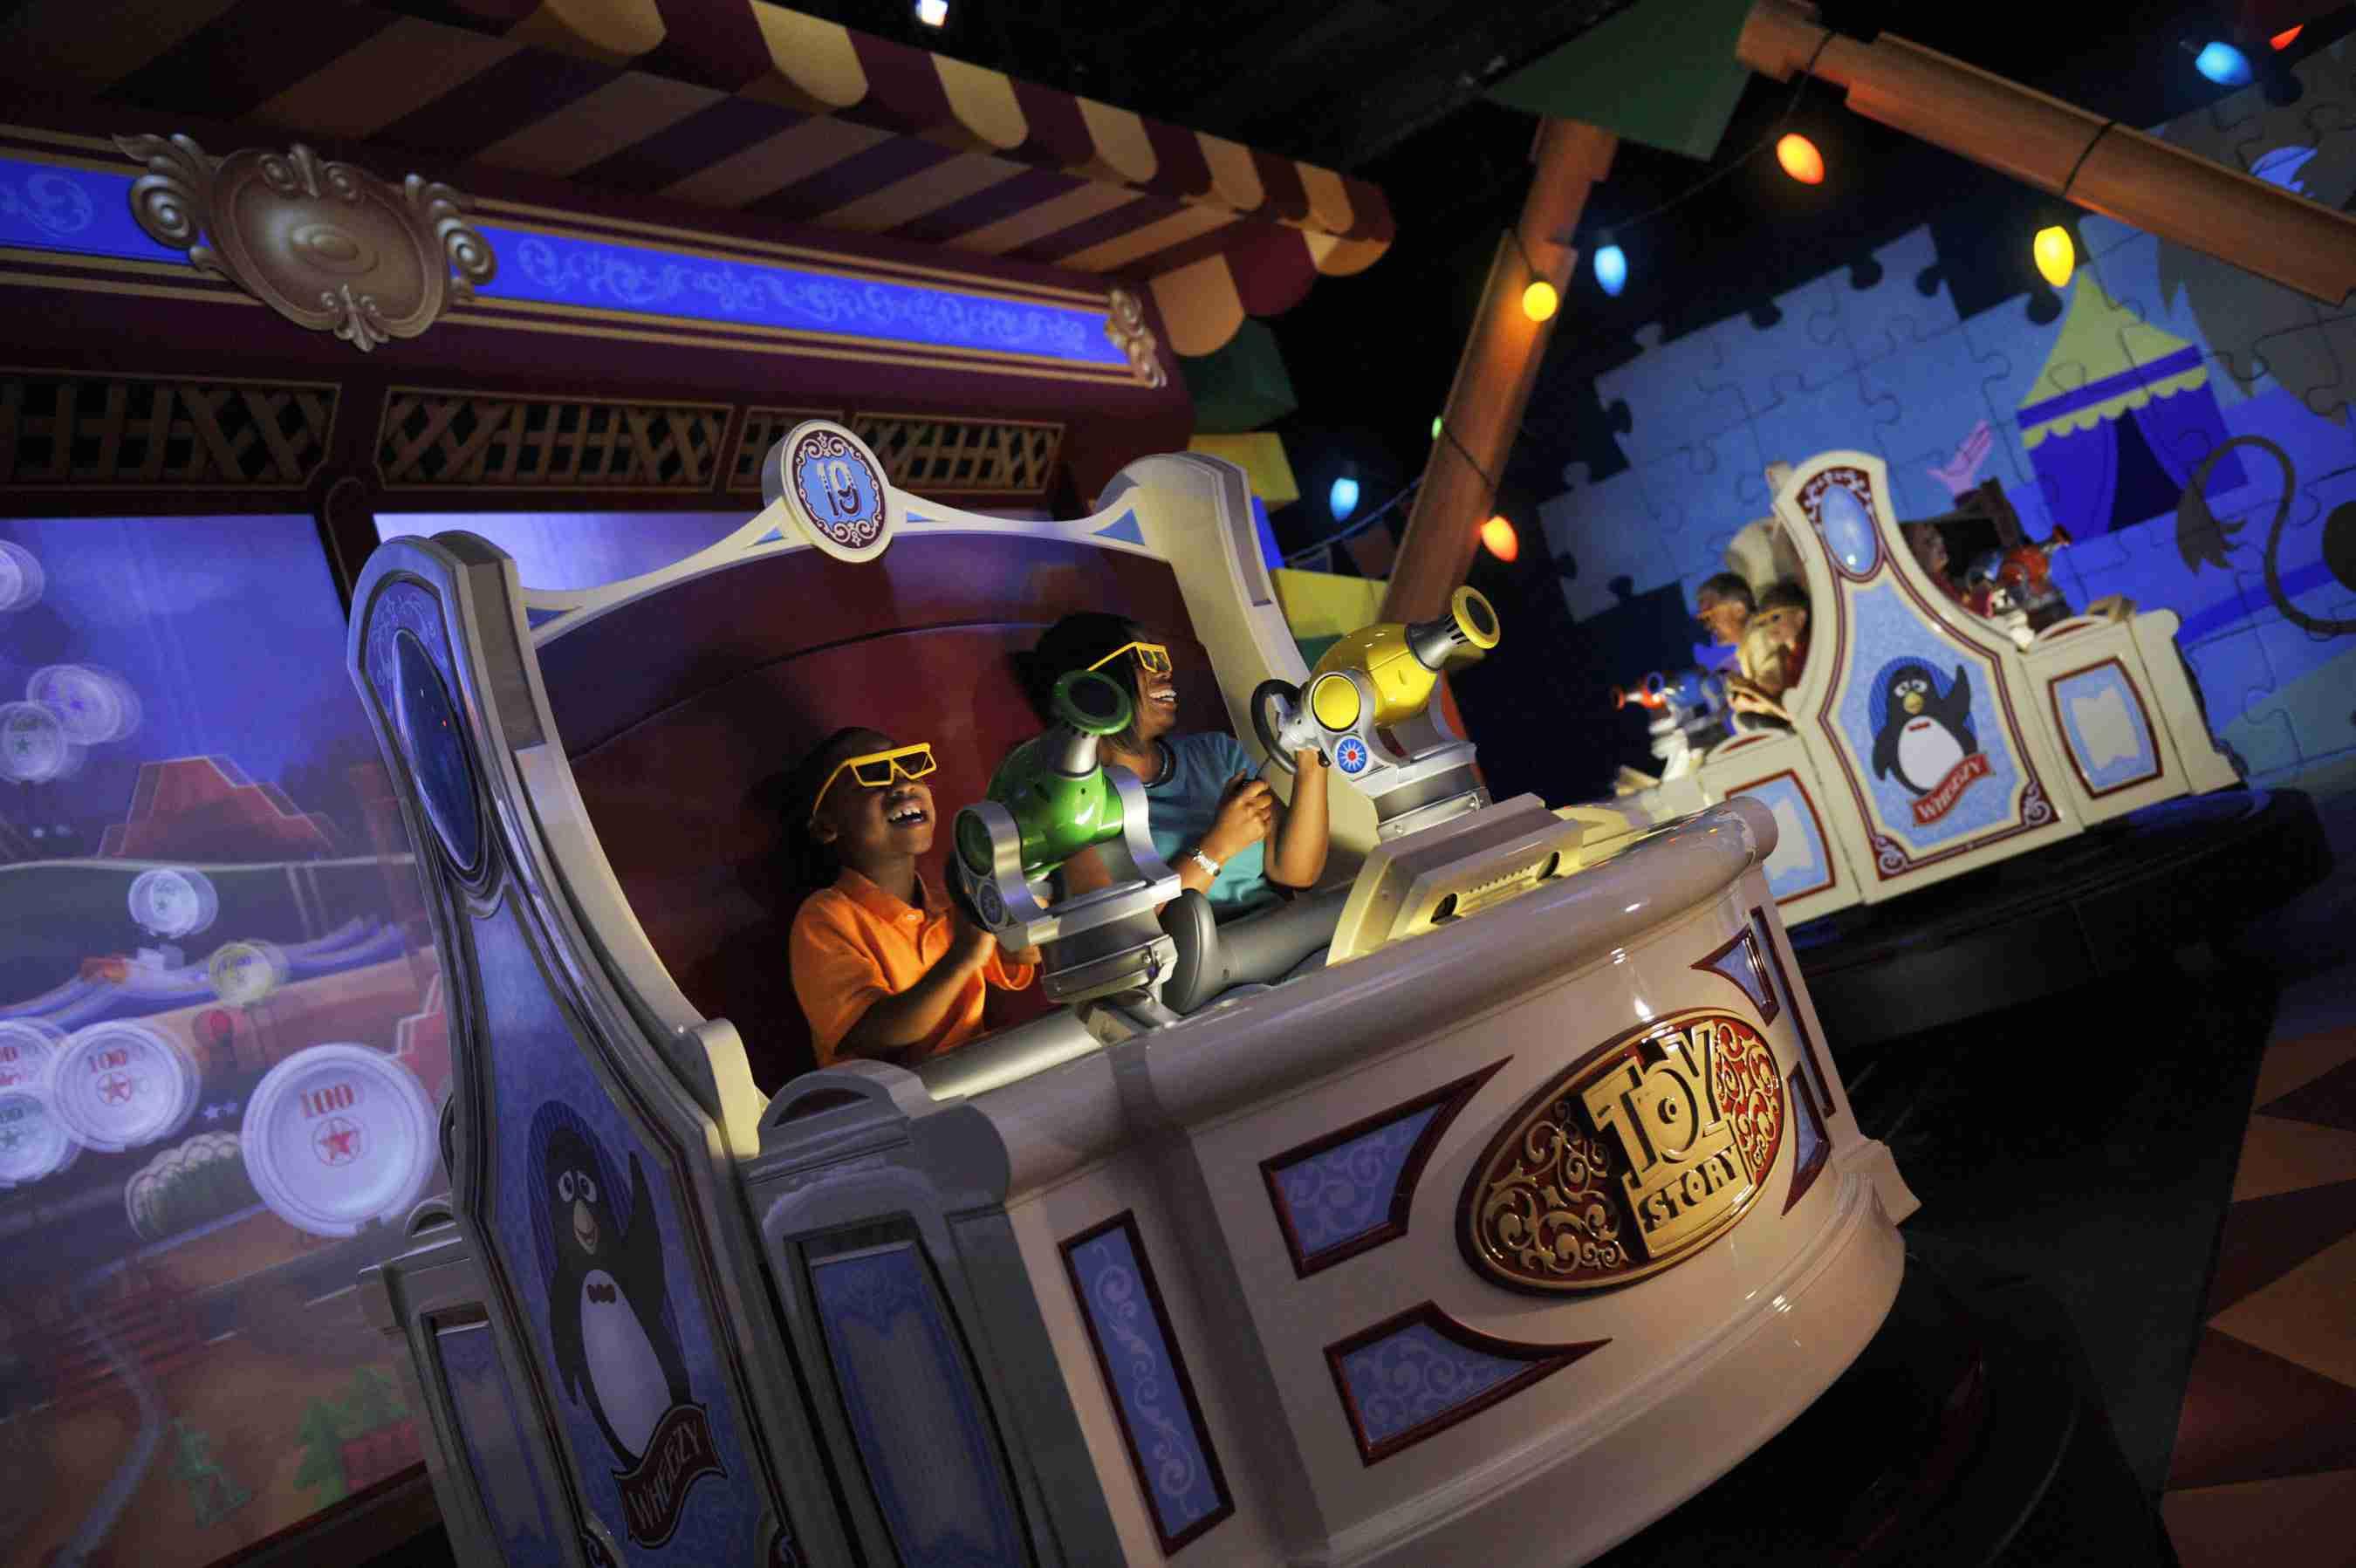 Toy Story Mania ride at Walt Disney World.